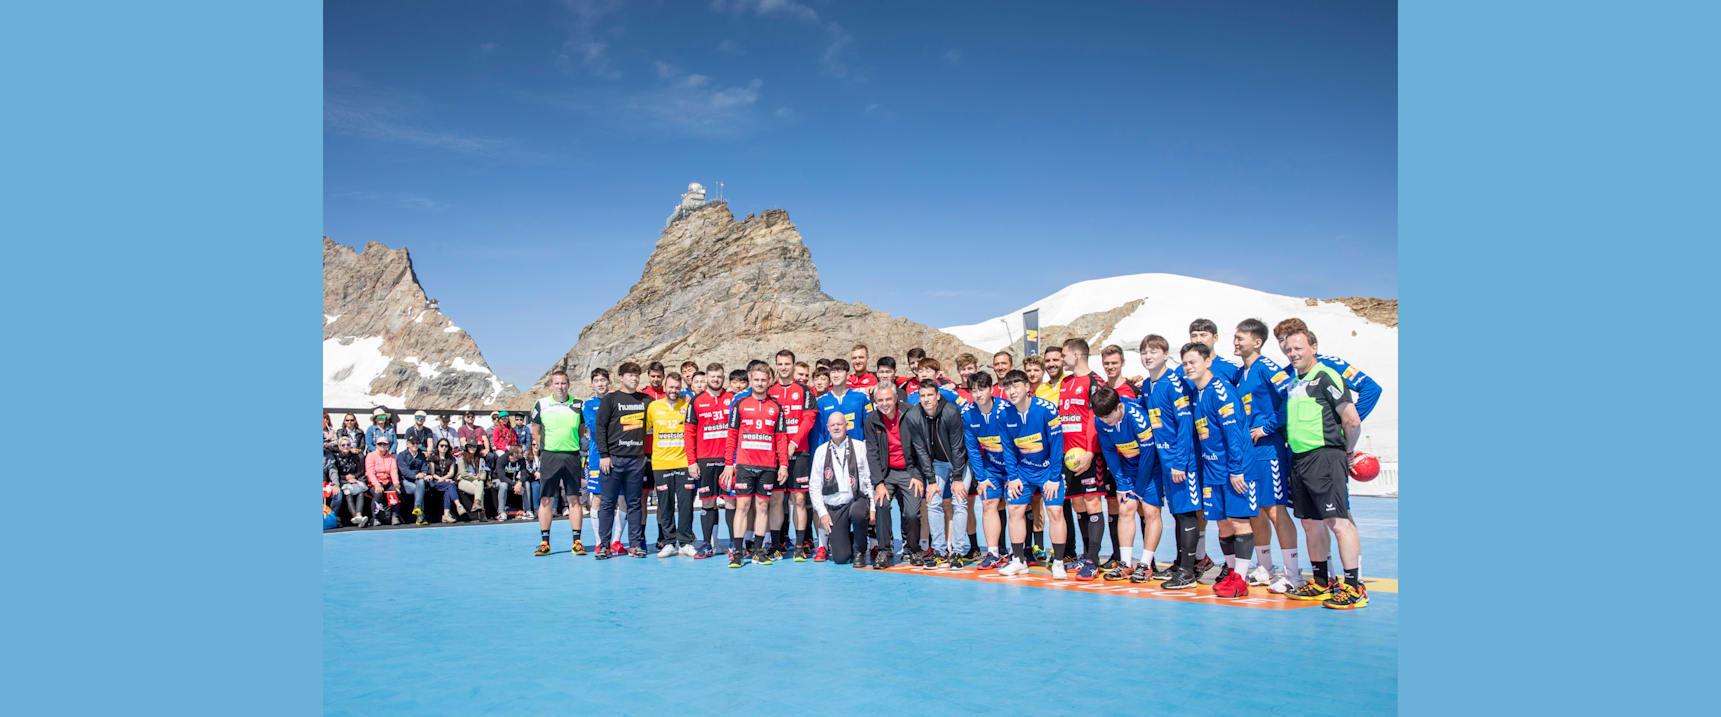 Handball 5 BSV Bern und Koreanische Nationalmannschaft mit Andy Schmid Urs Kessler und Peter Roethlisberger